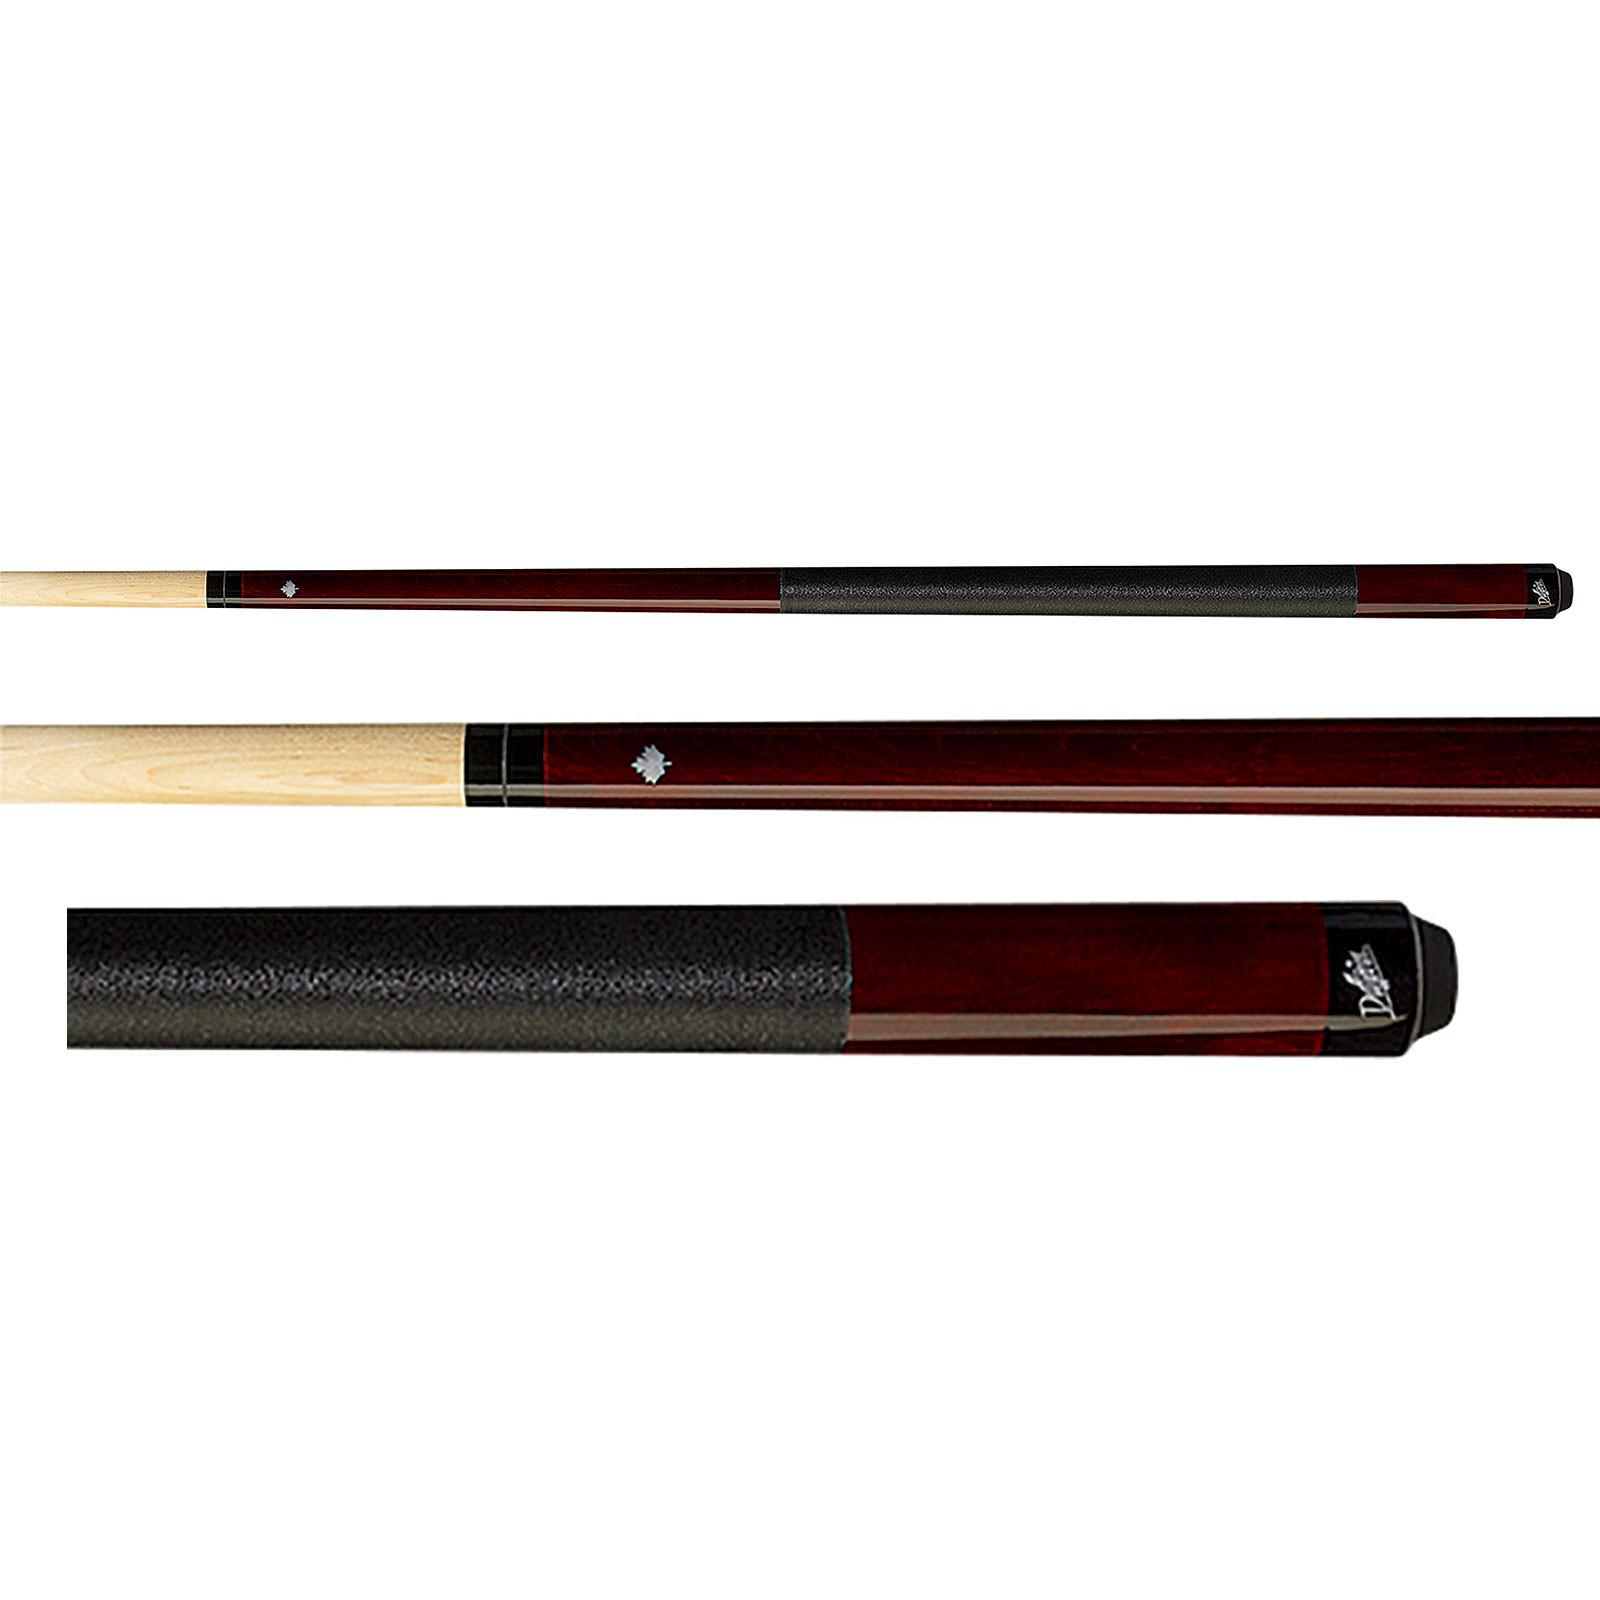 Dufferin D-231 Deep Oxblood Pool Cue Stick